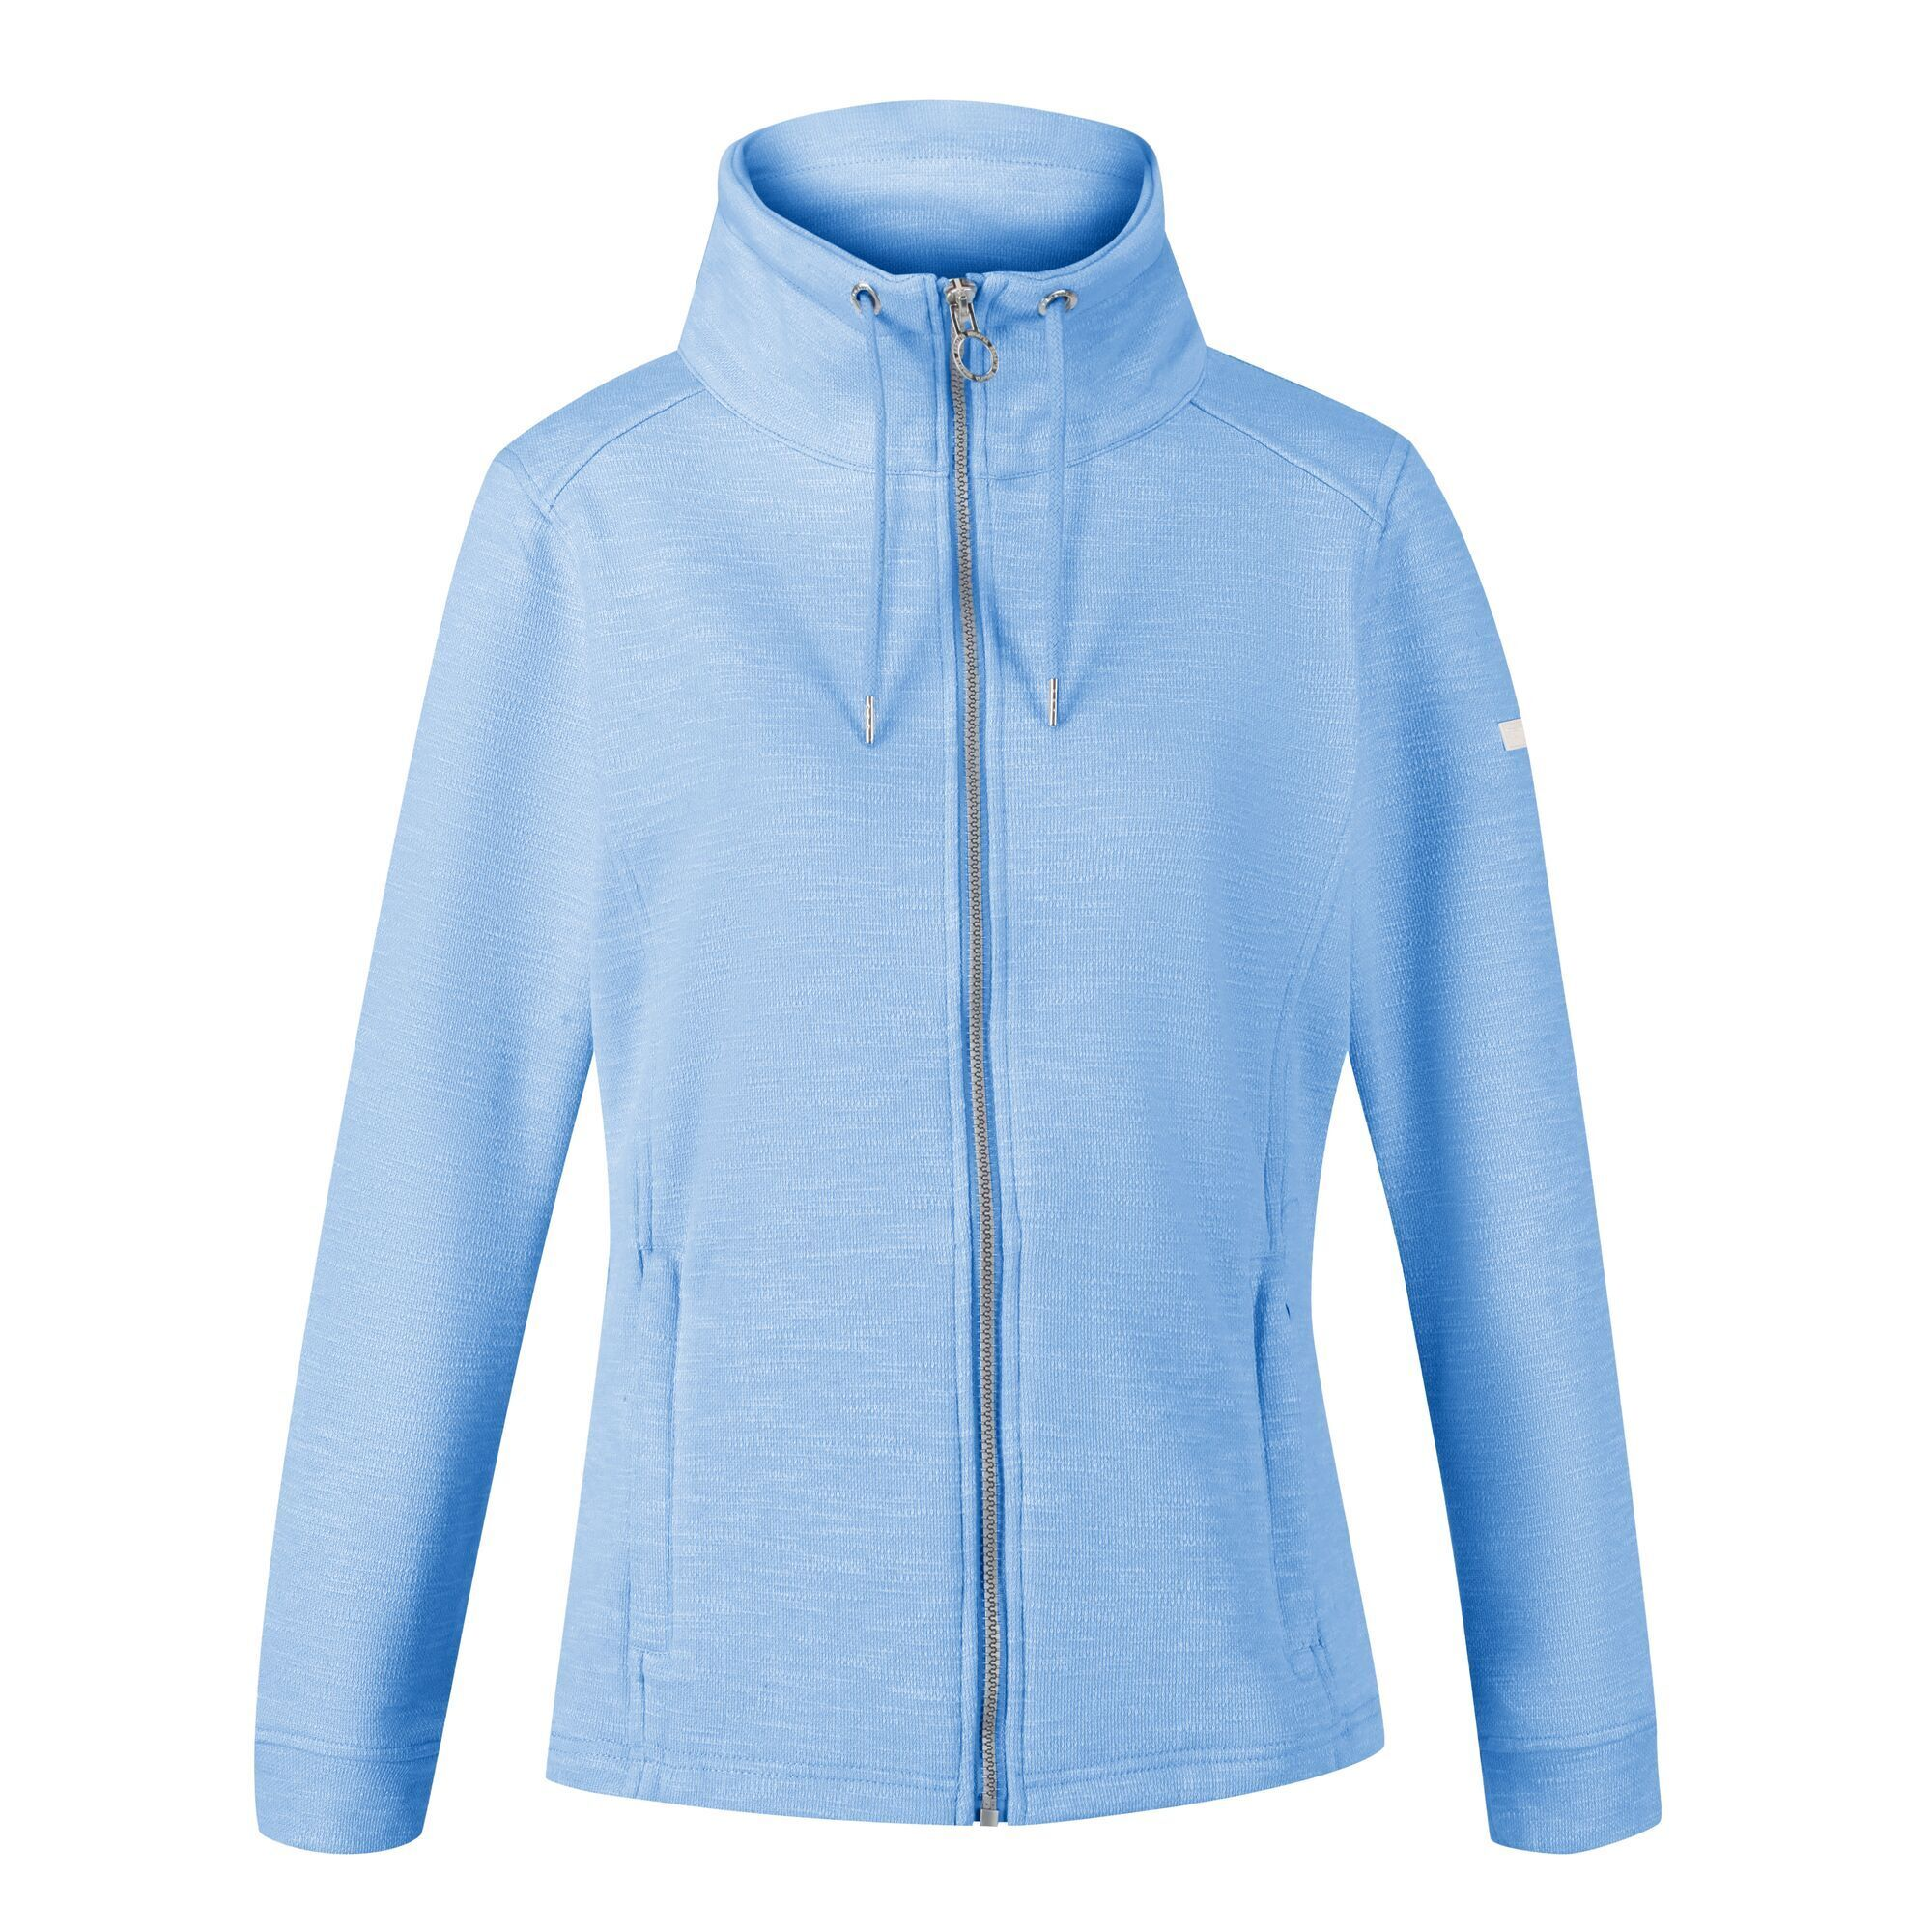 Regatta Womens/Ladies Olena Snood Collar Fleece Jacket (8 UK) (Sky Blue)